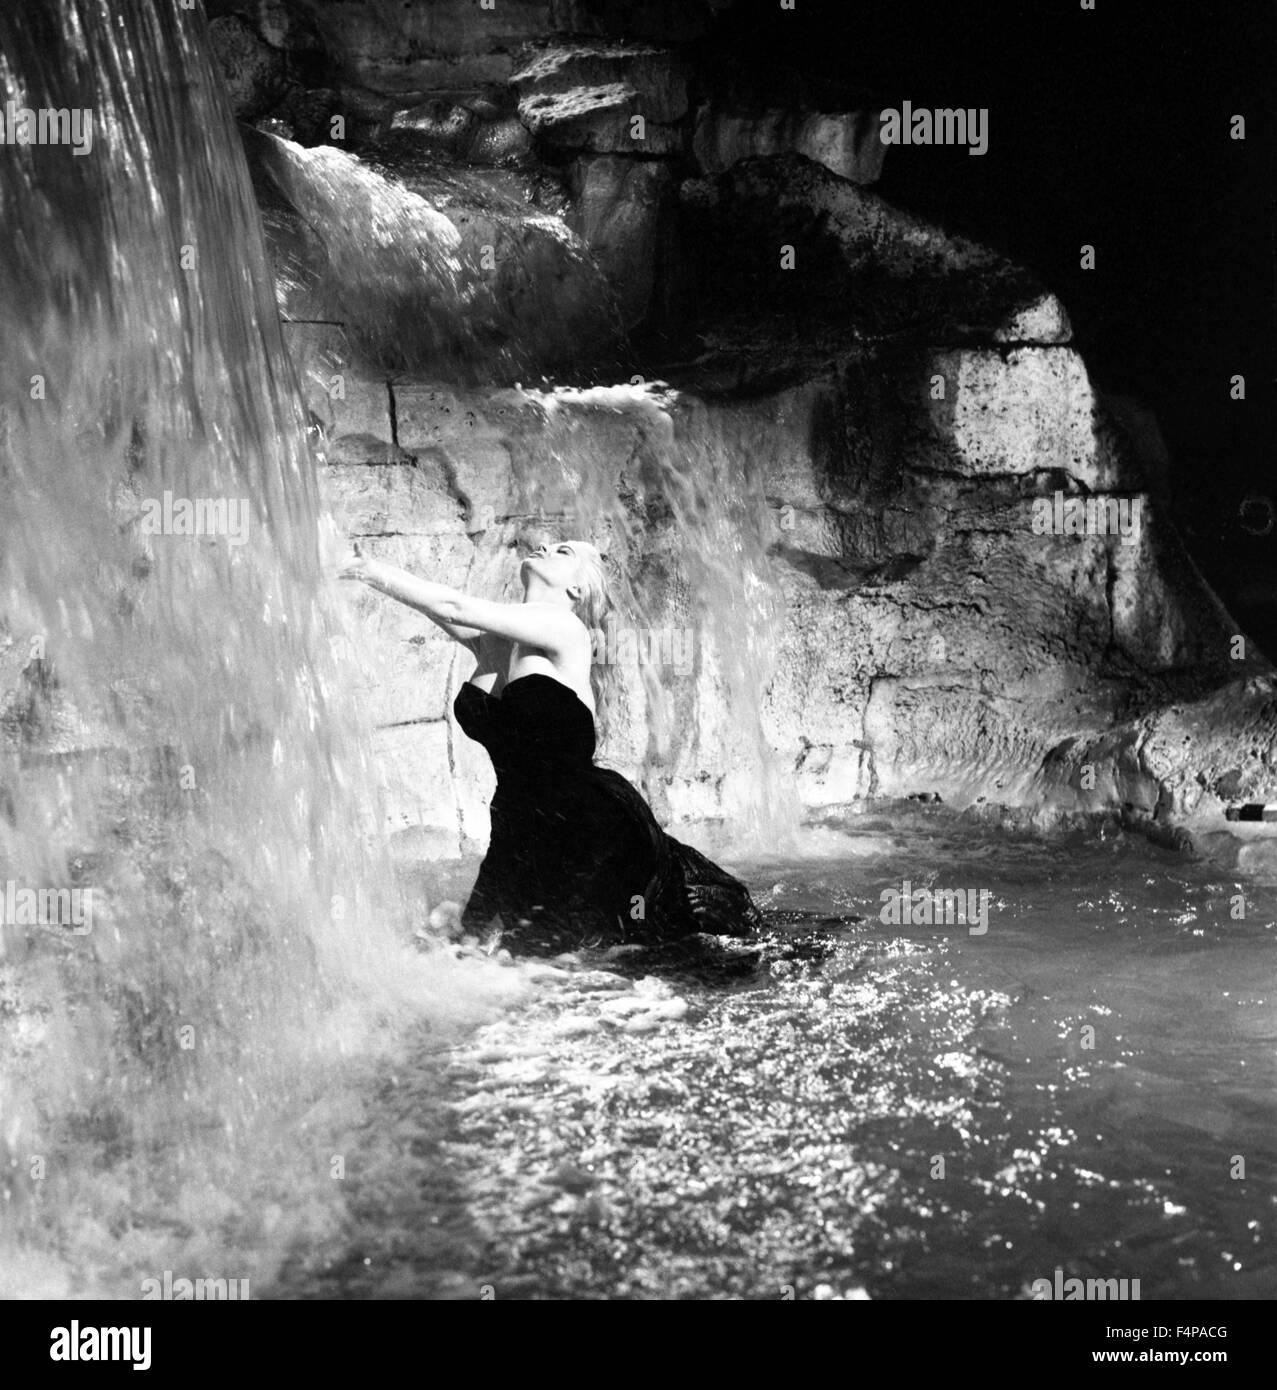 Anita Ekberg / La Dolce Vita 1960 directed by Federico Fellini - Stock Image